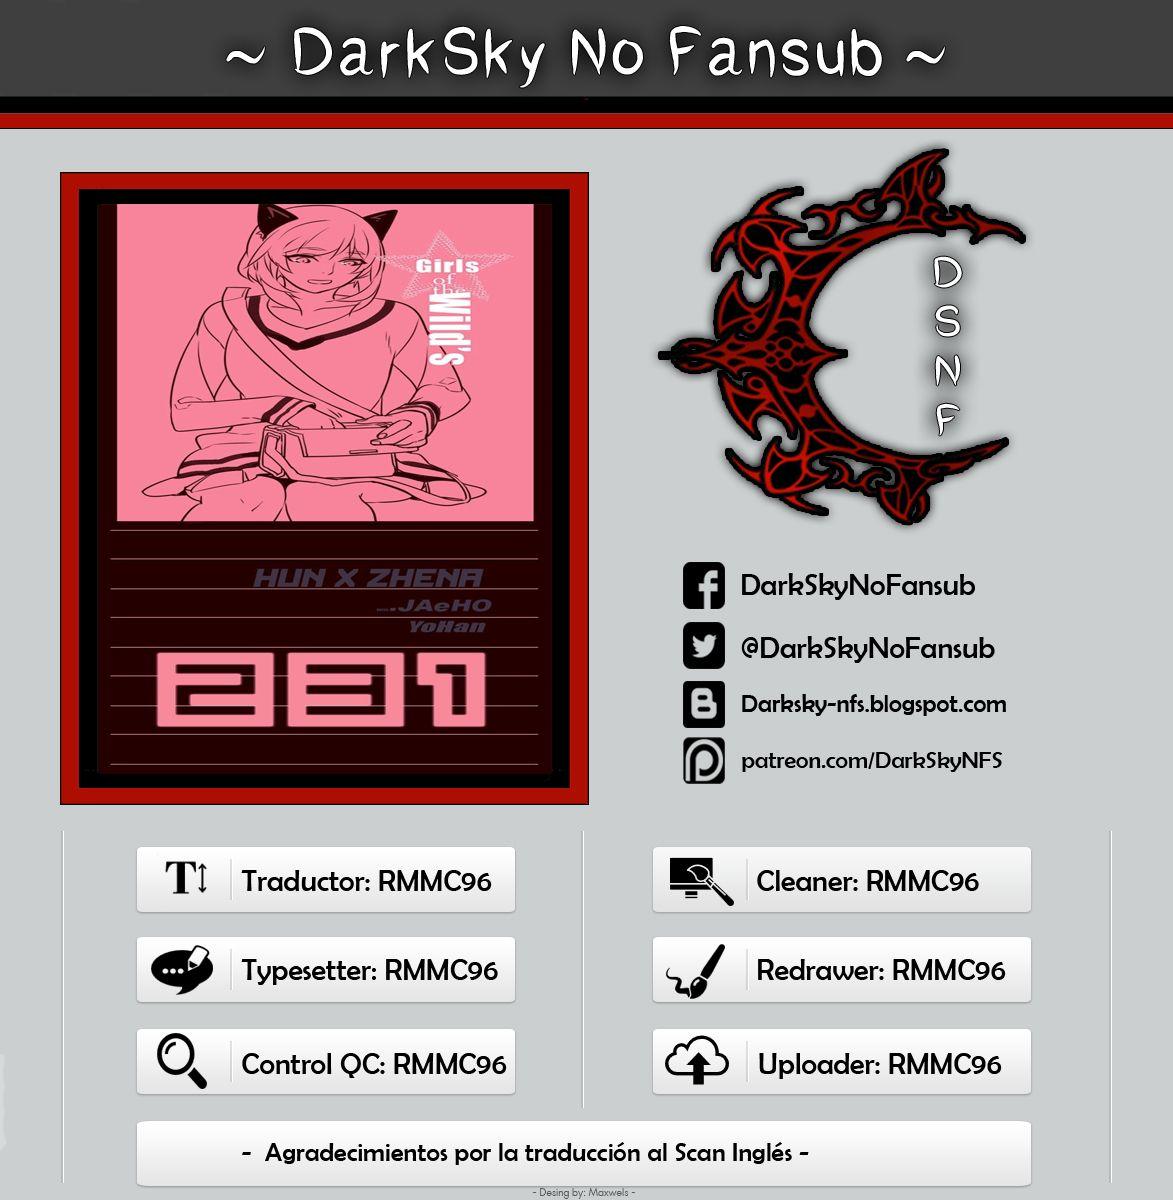 http://c5.ninemanga.com/es_manga/32/416/455197/0d012a47399f189a1fd2a147eb59130a.jpg Page 1